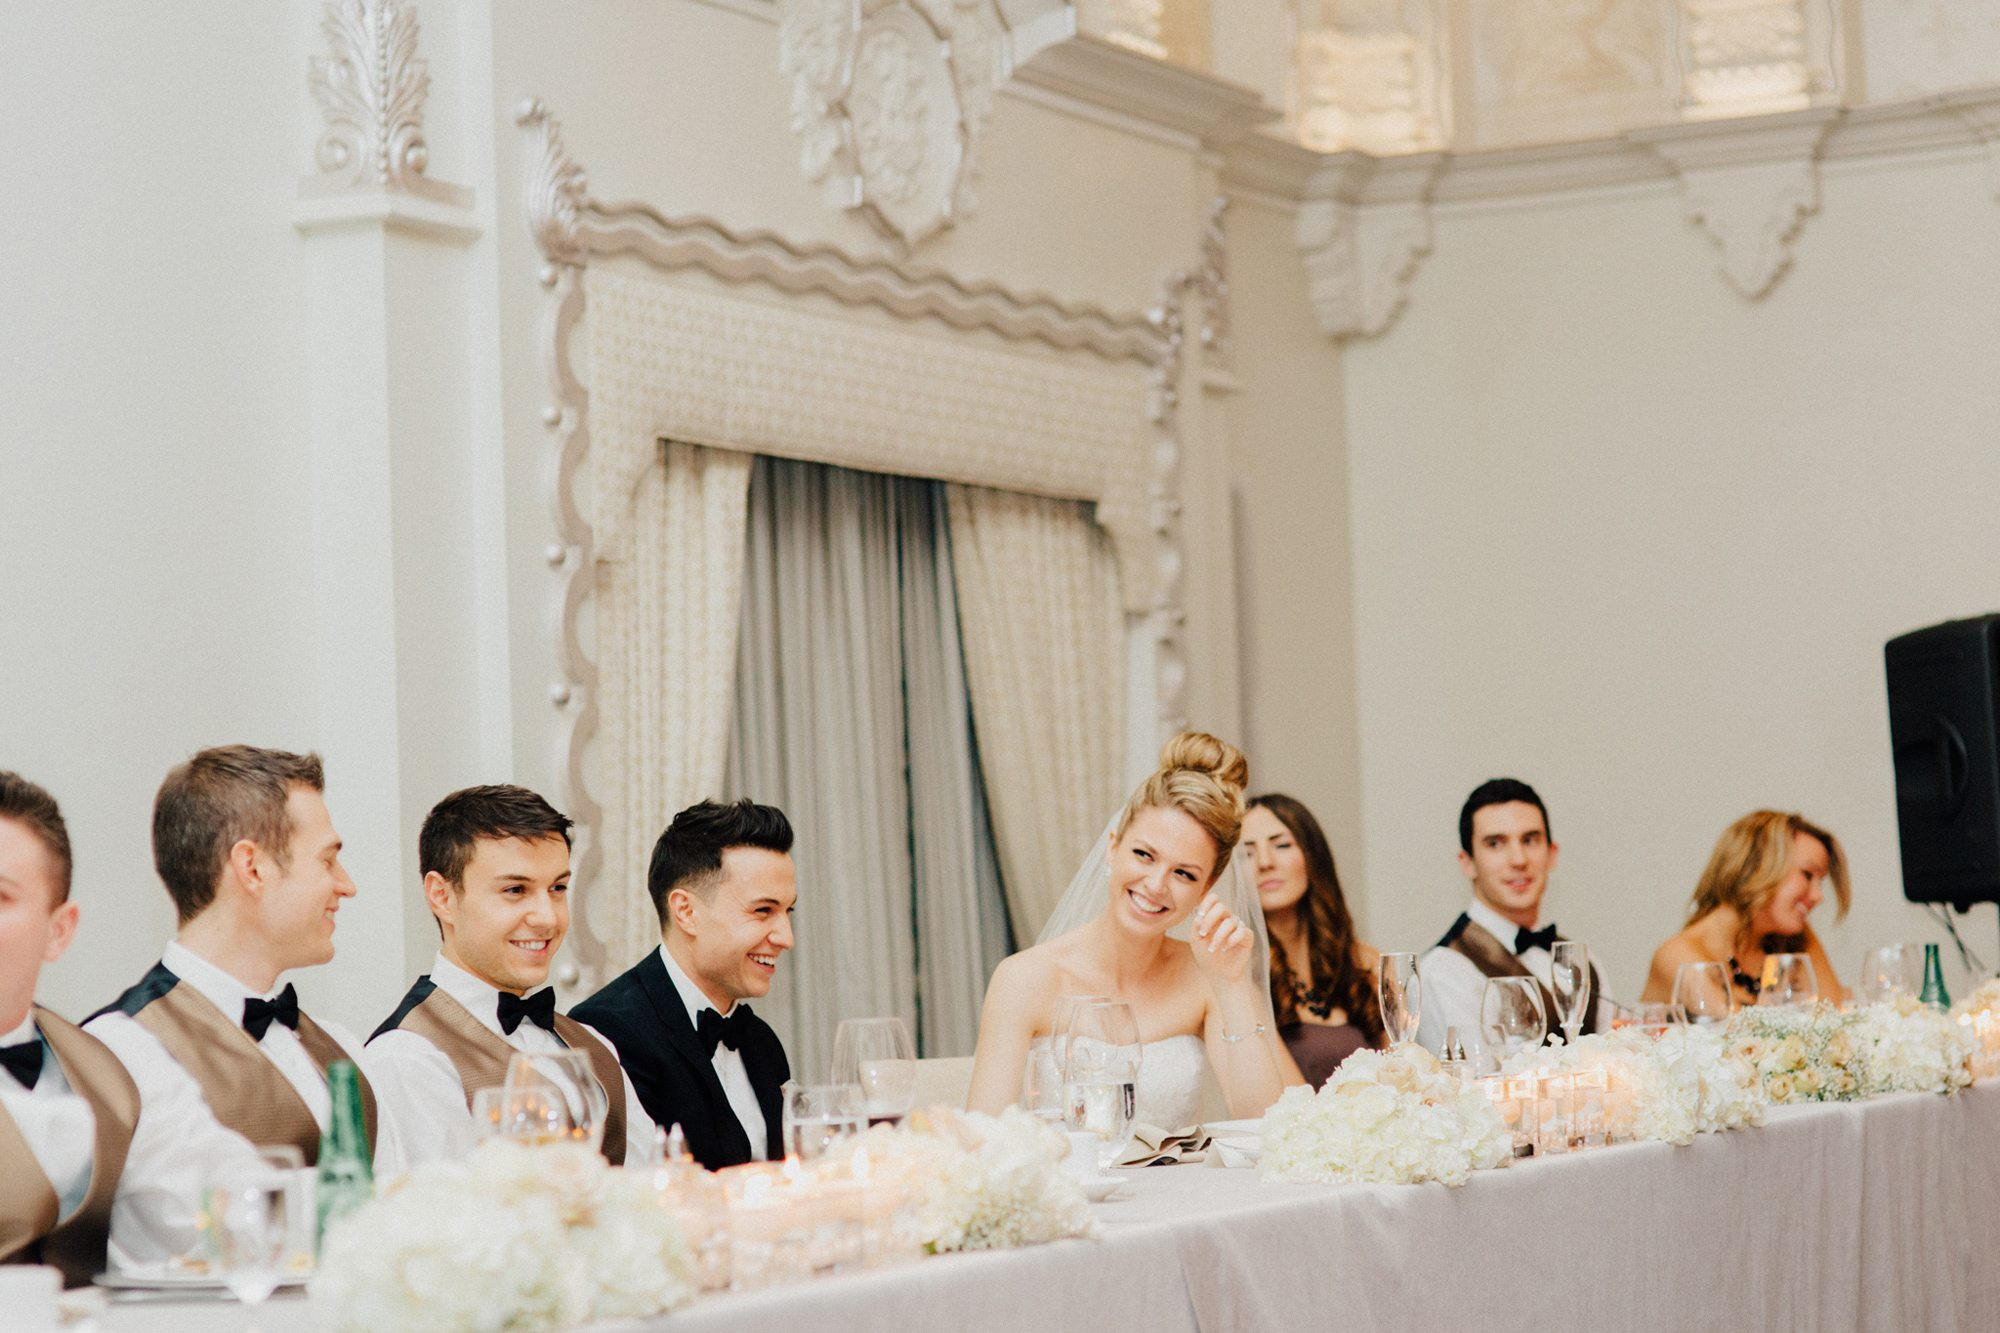 074-vancouver-wedding-photographer